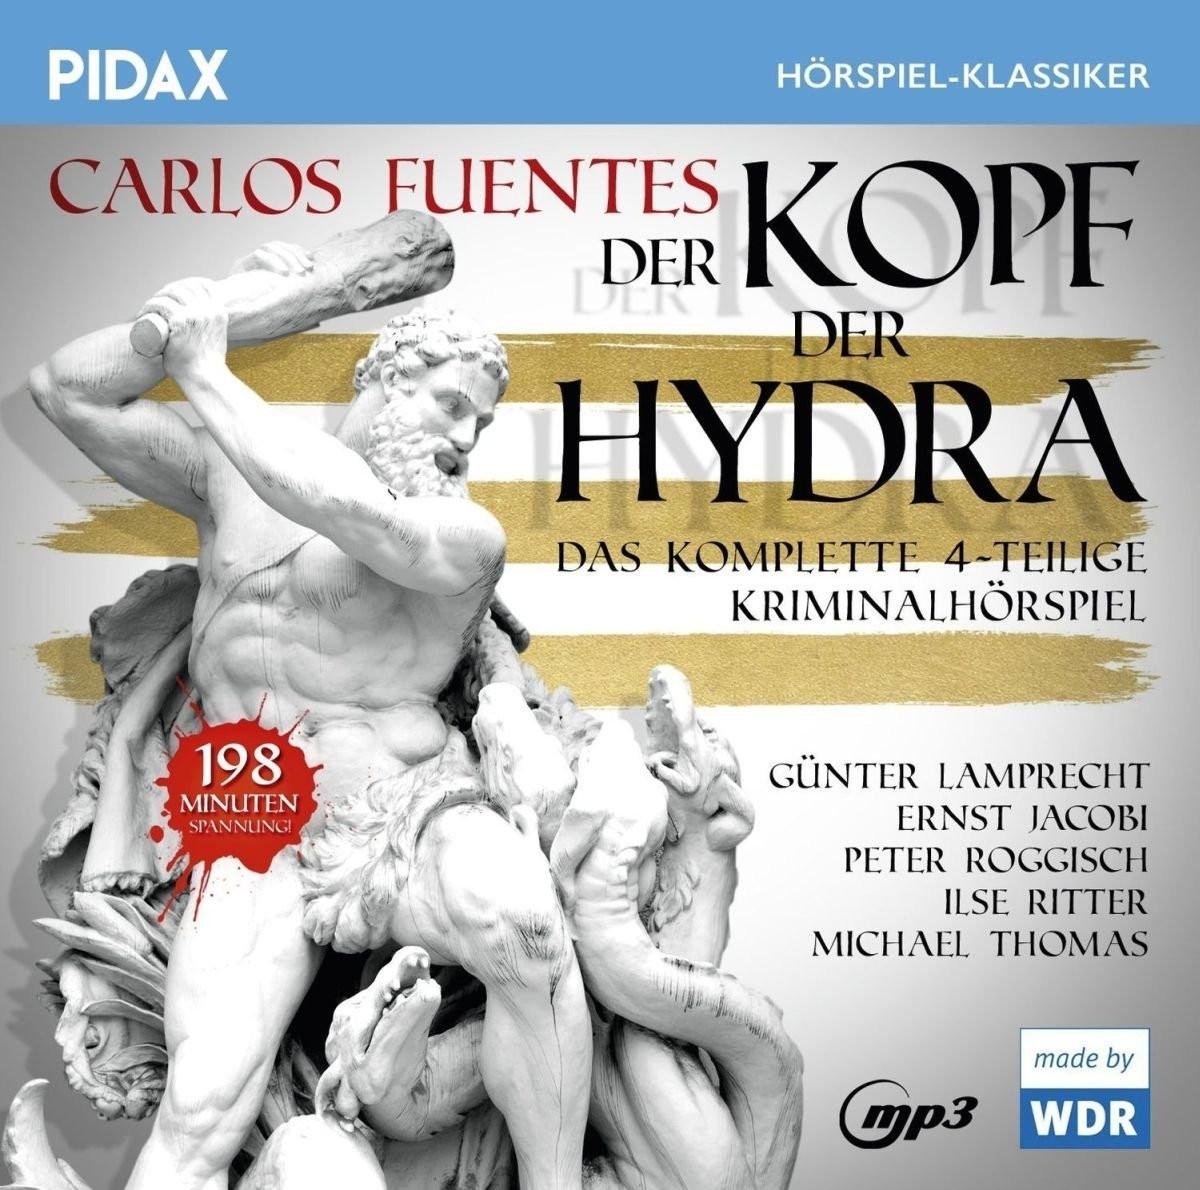 Pidax Hörspiel Klassiker - Der Kopf der Hydra